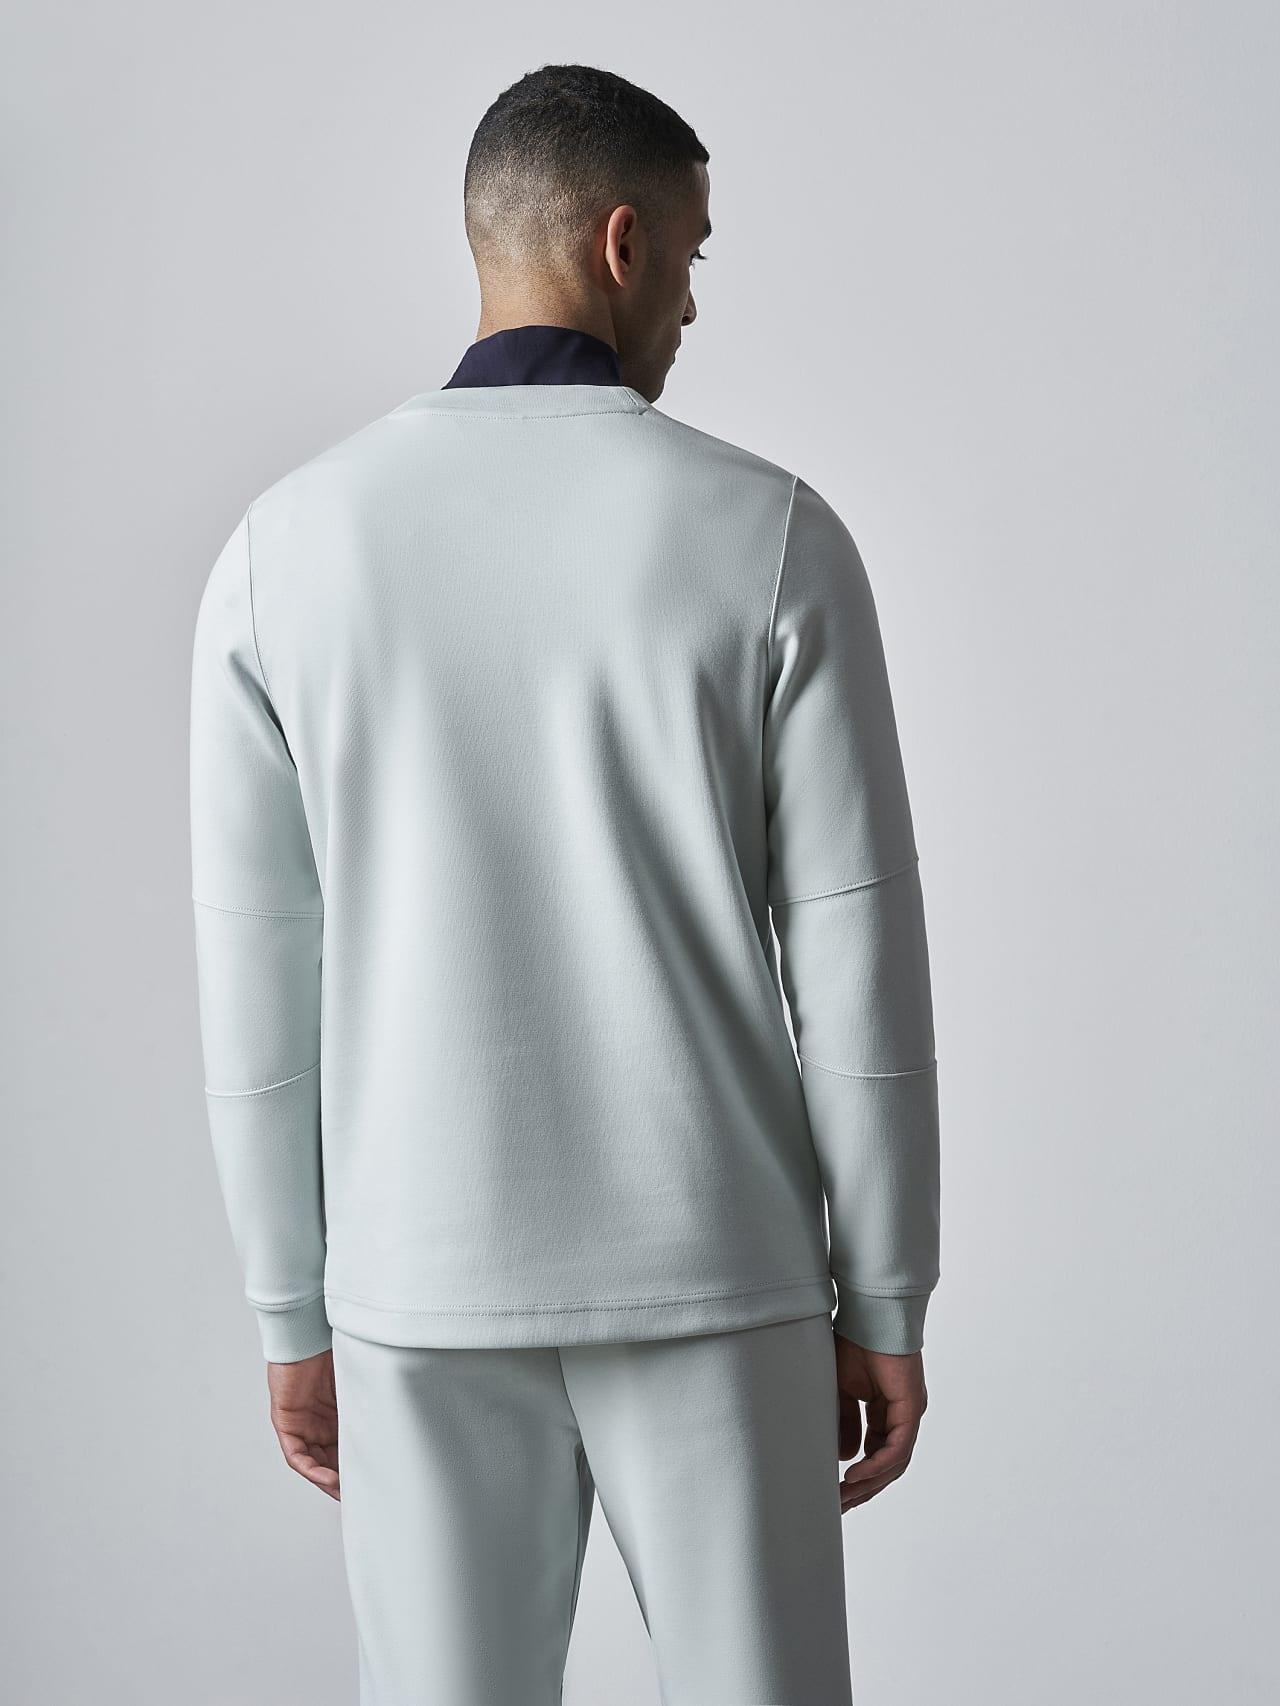 SCONA V1.Y5.02 Premium Sweatshirt Blass Blau Haupt Vorne Alpha Tauri